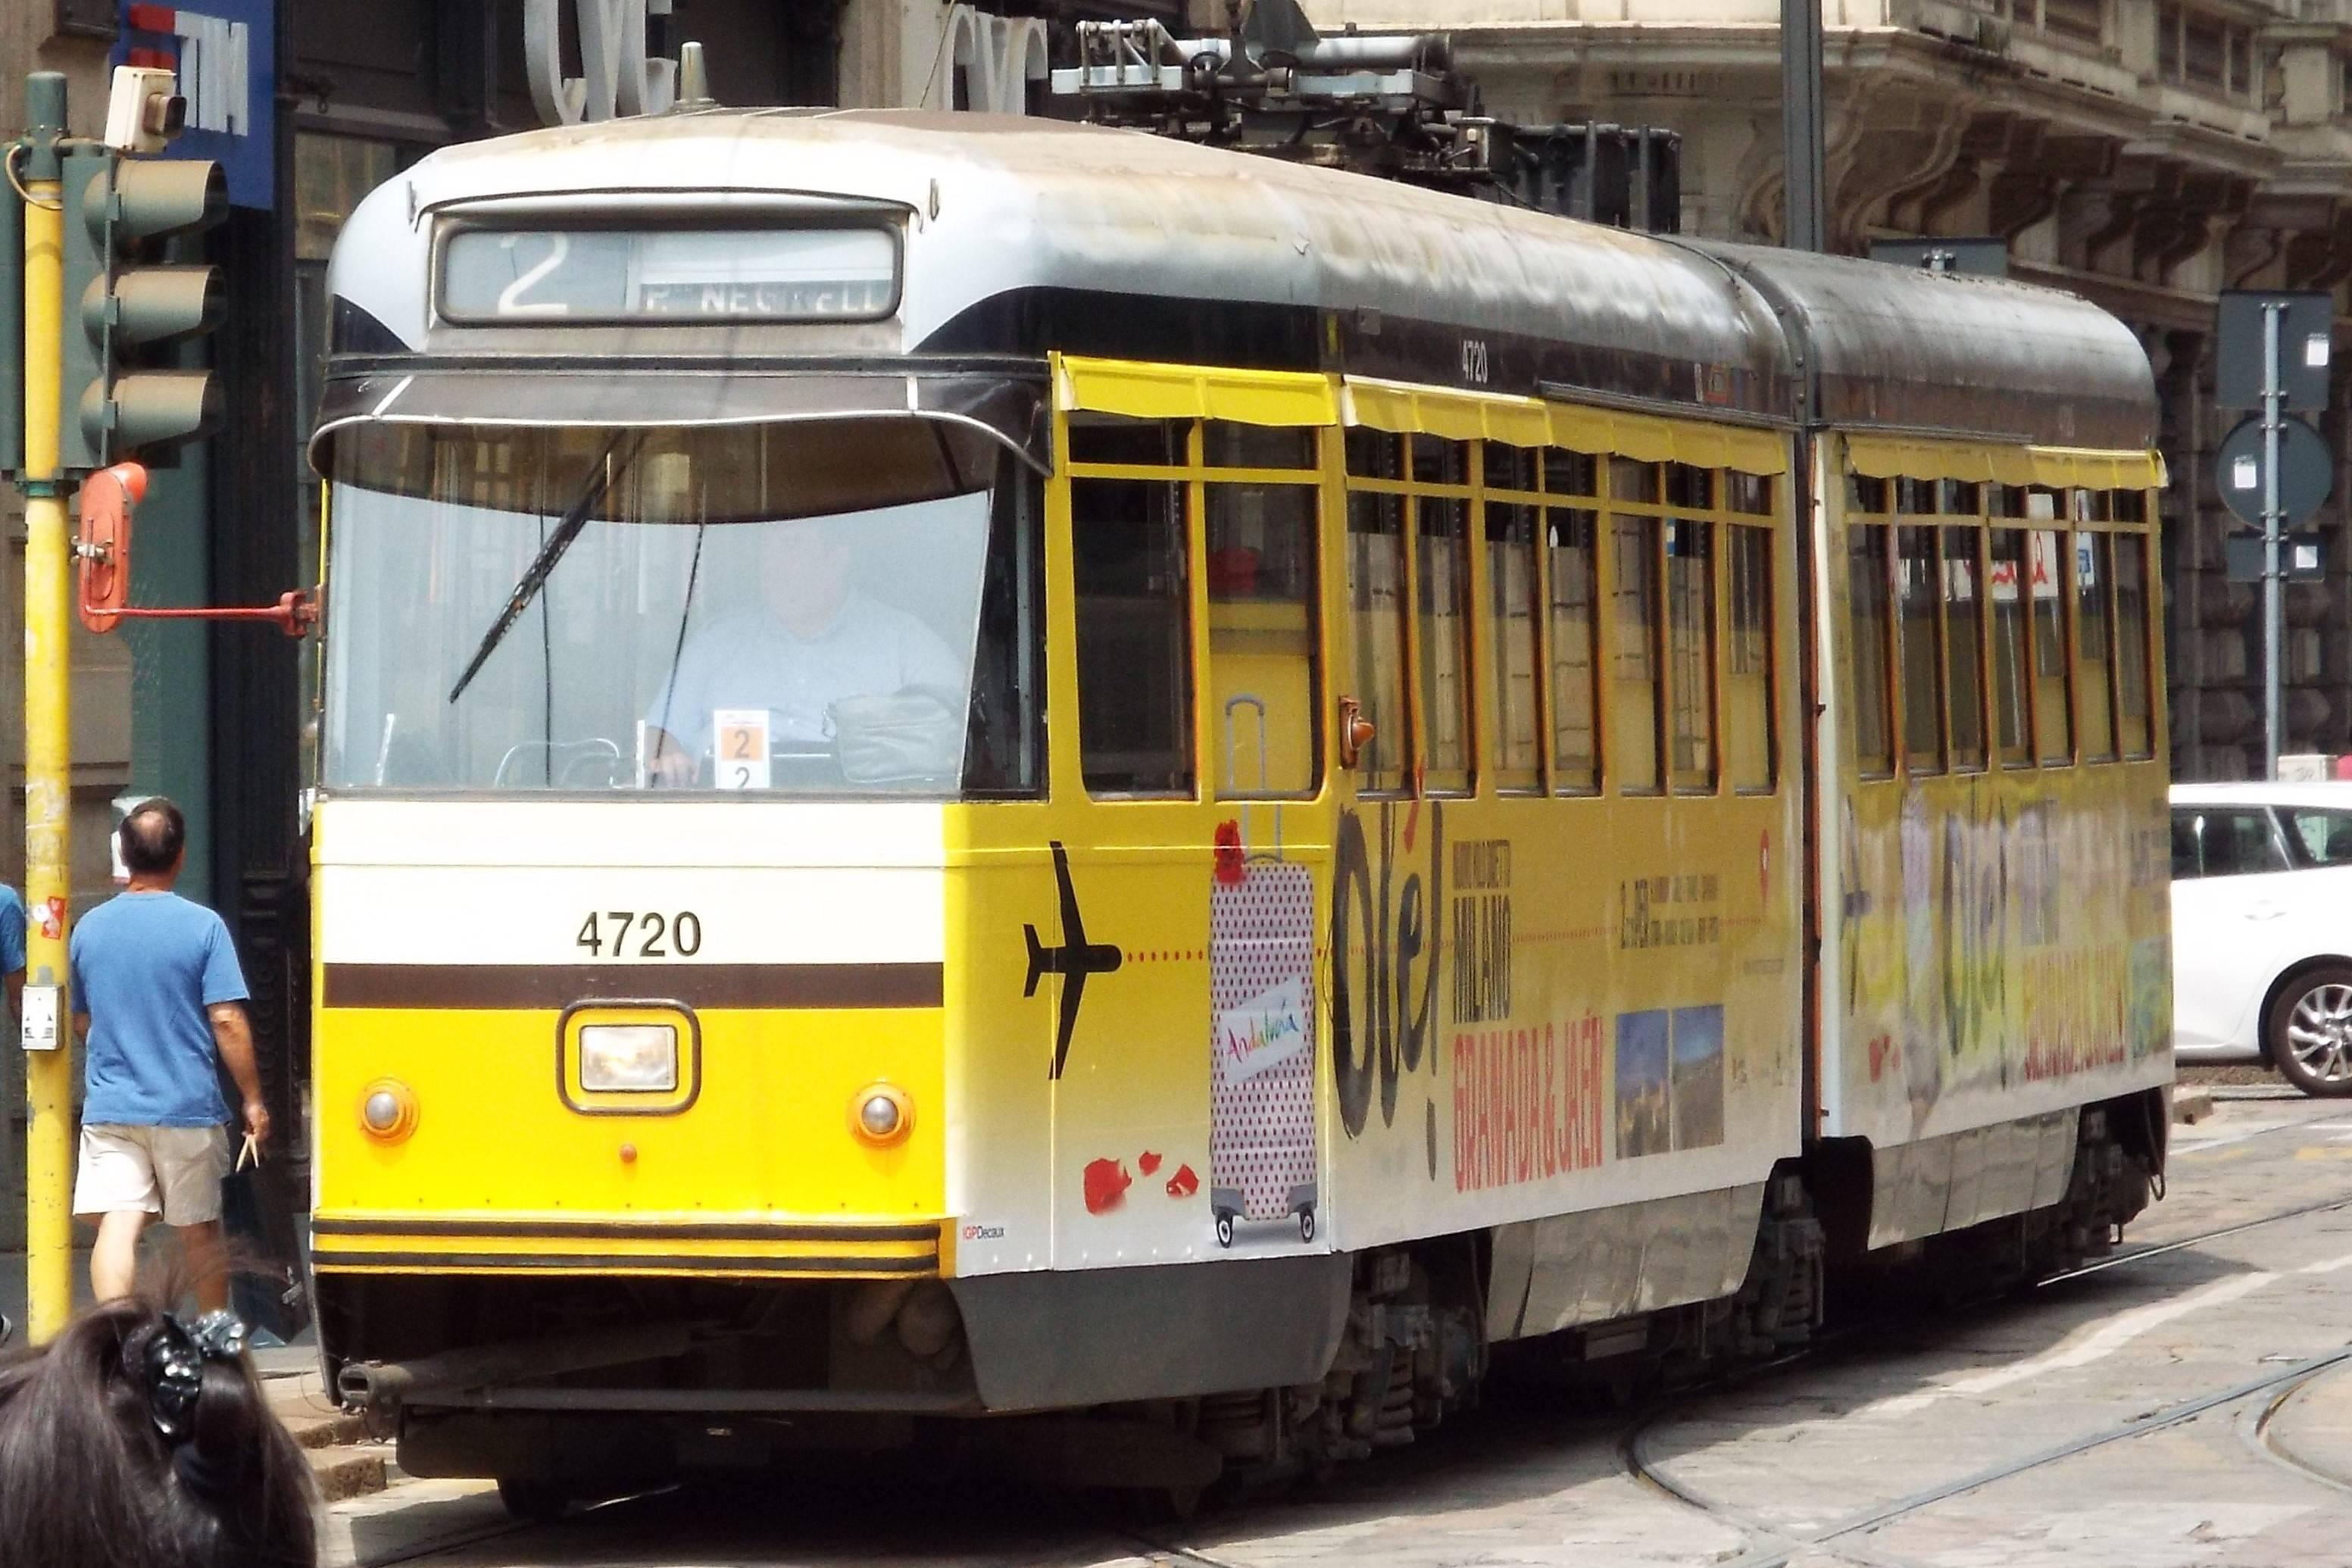 A Series 4700 Tram